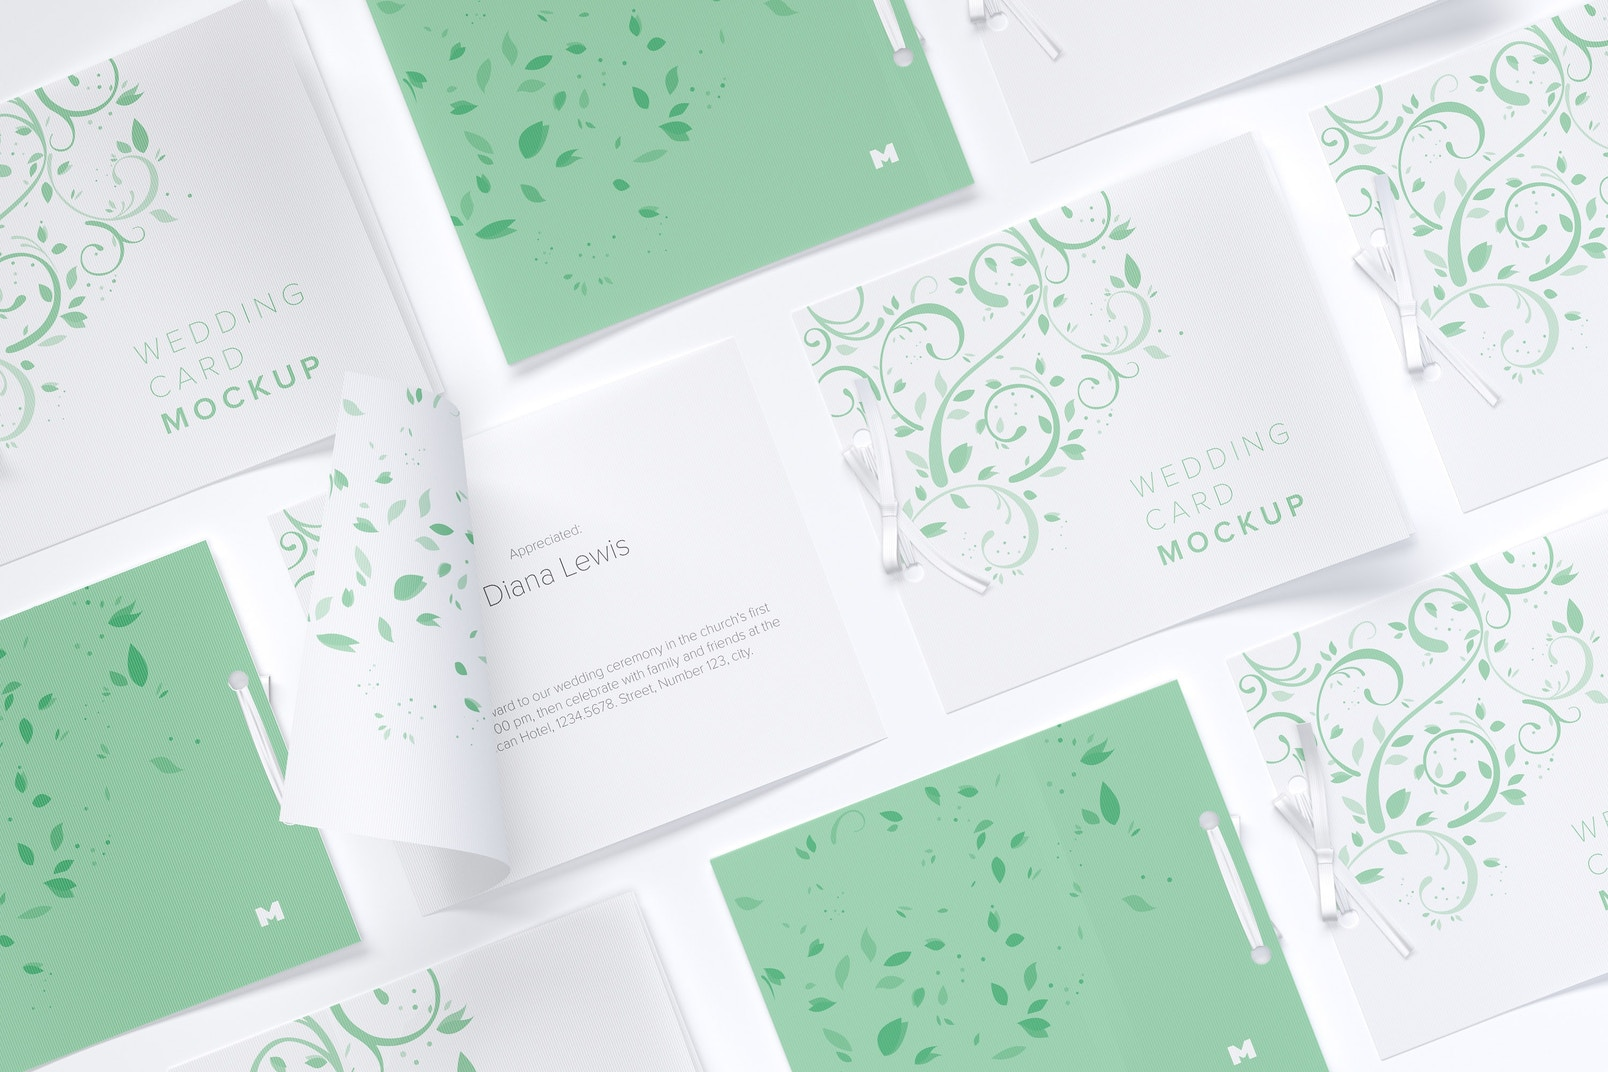 Wedding Cards Mockup, Grid Layout